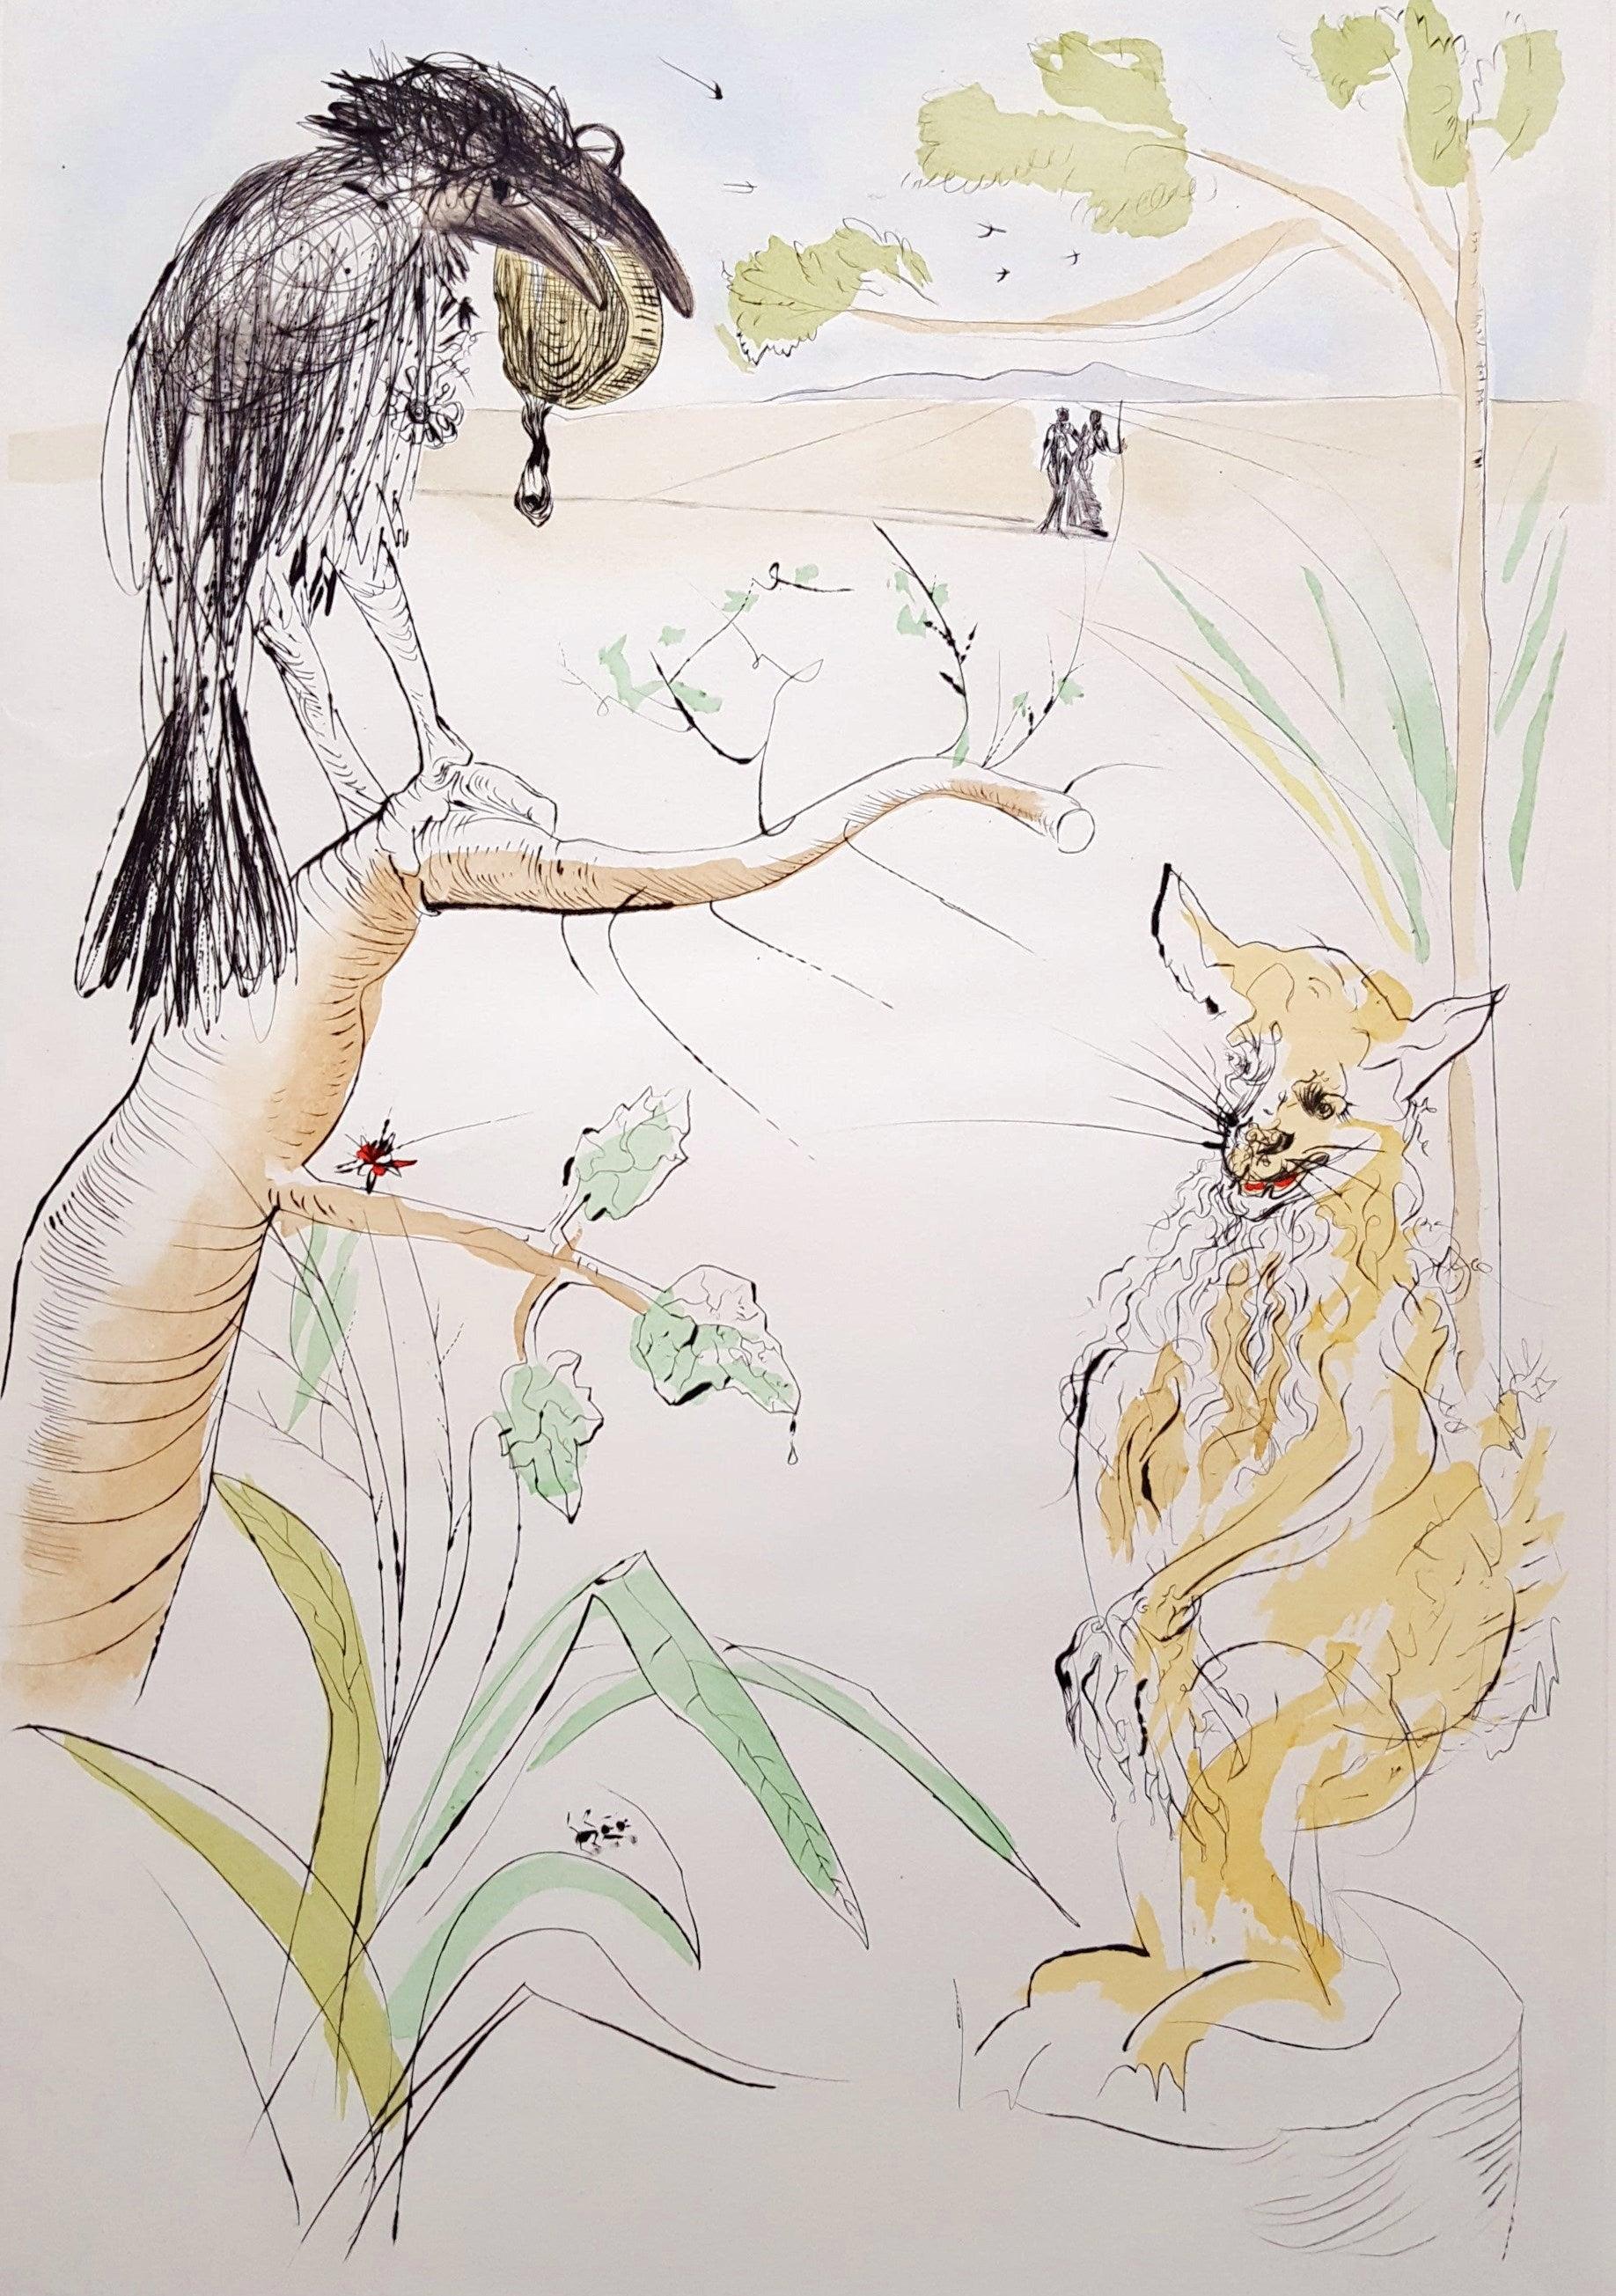 a317982e6fd Salvador Dalí - Le Corbeau et le Renard (The Raven and the Fox ...